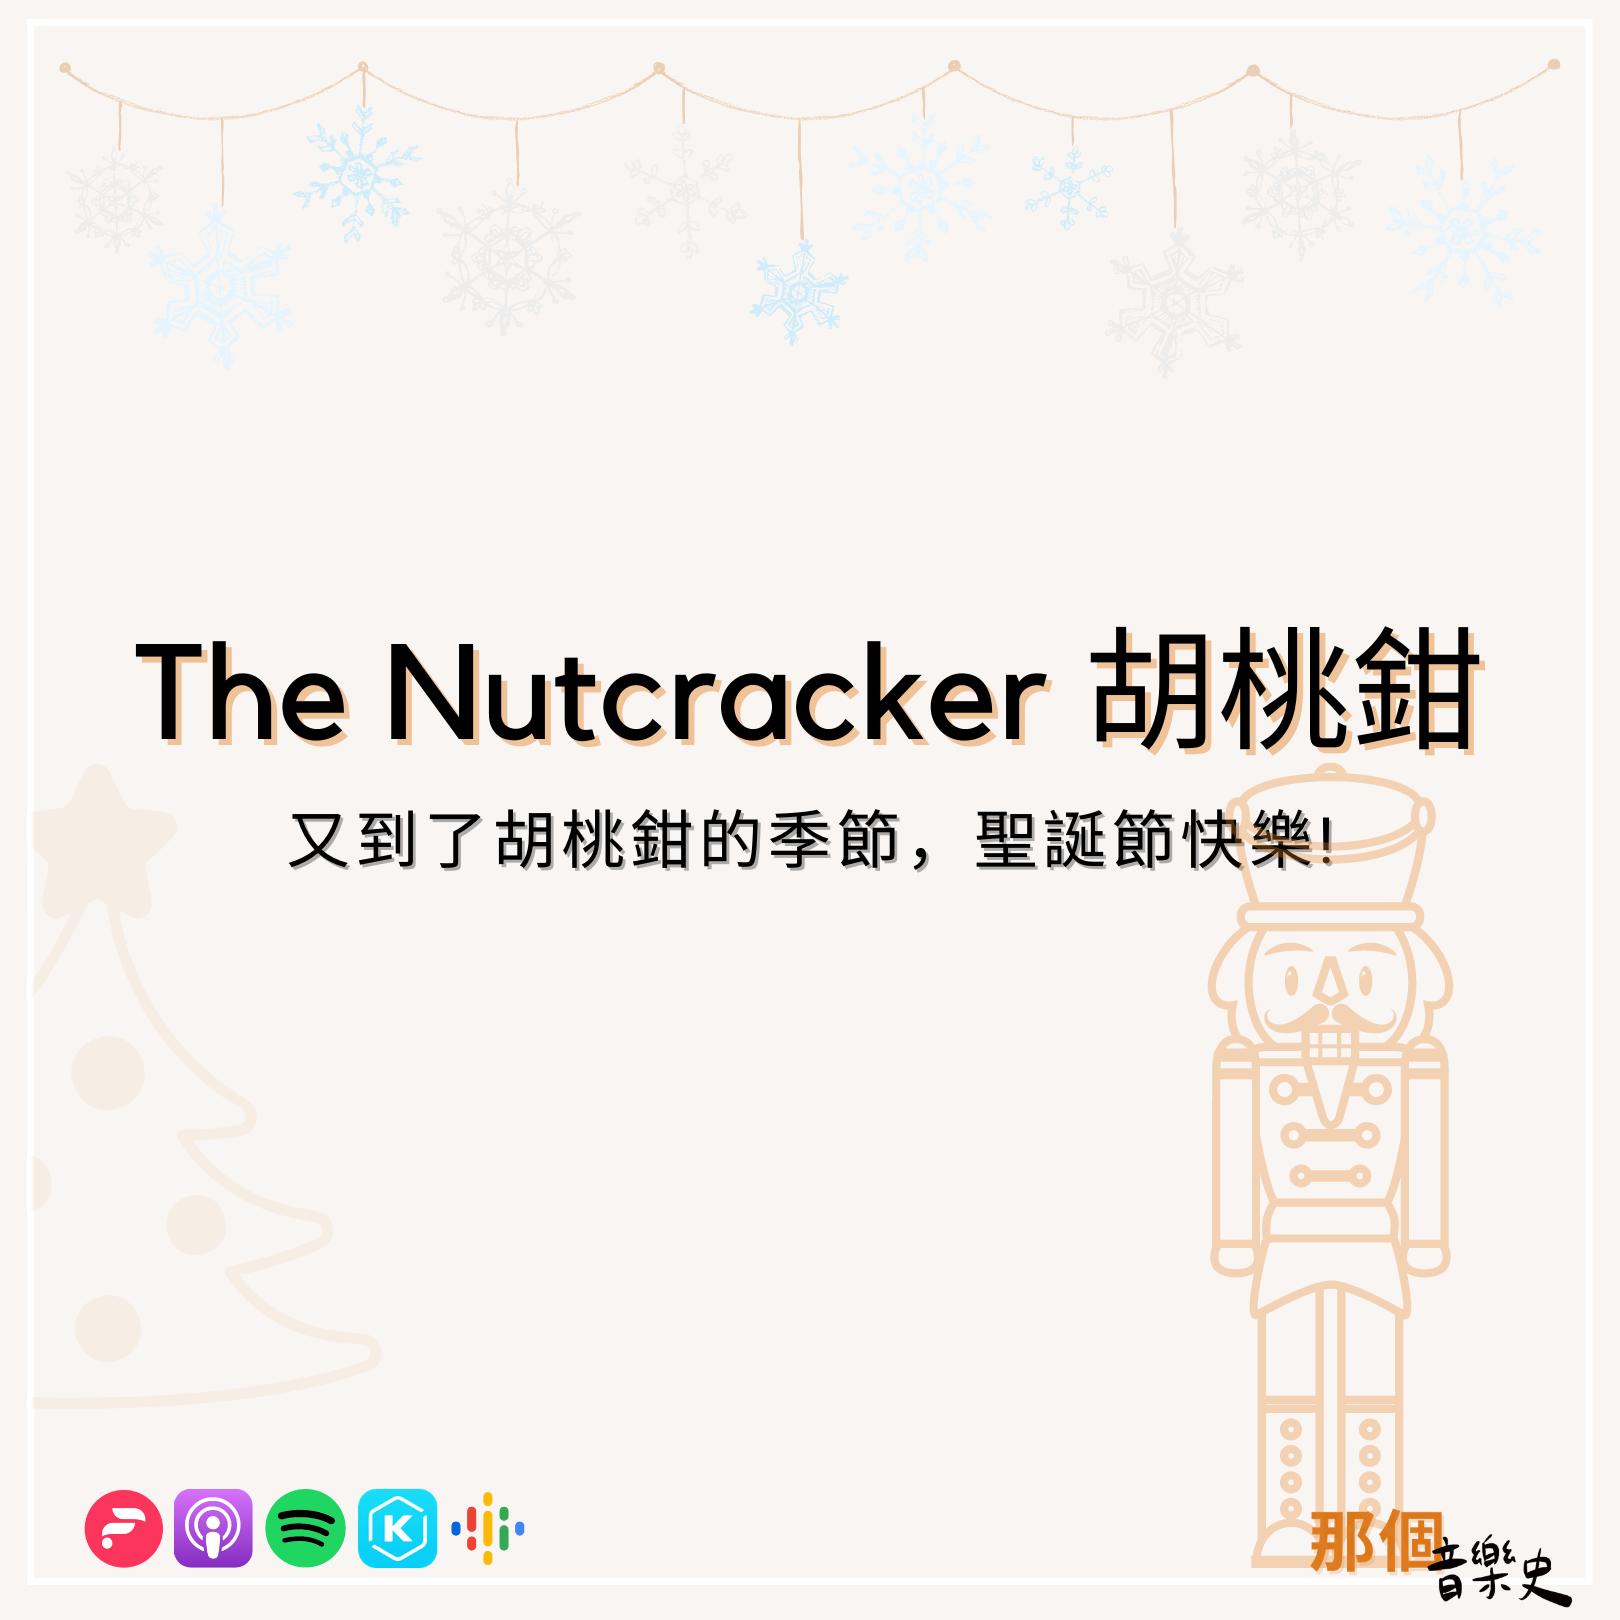 【The Nutcracker 胡桃鉗】又到了胡桃鉗的季節,聖誕節快樂!